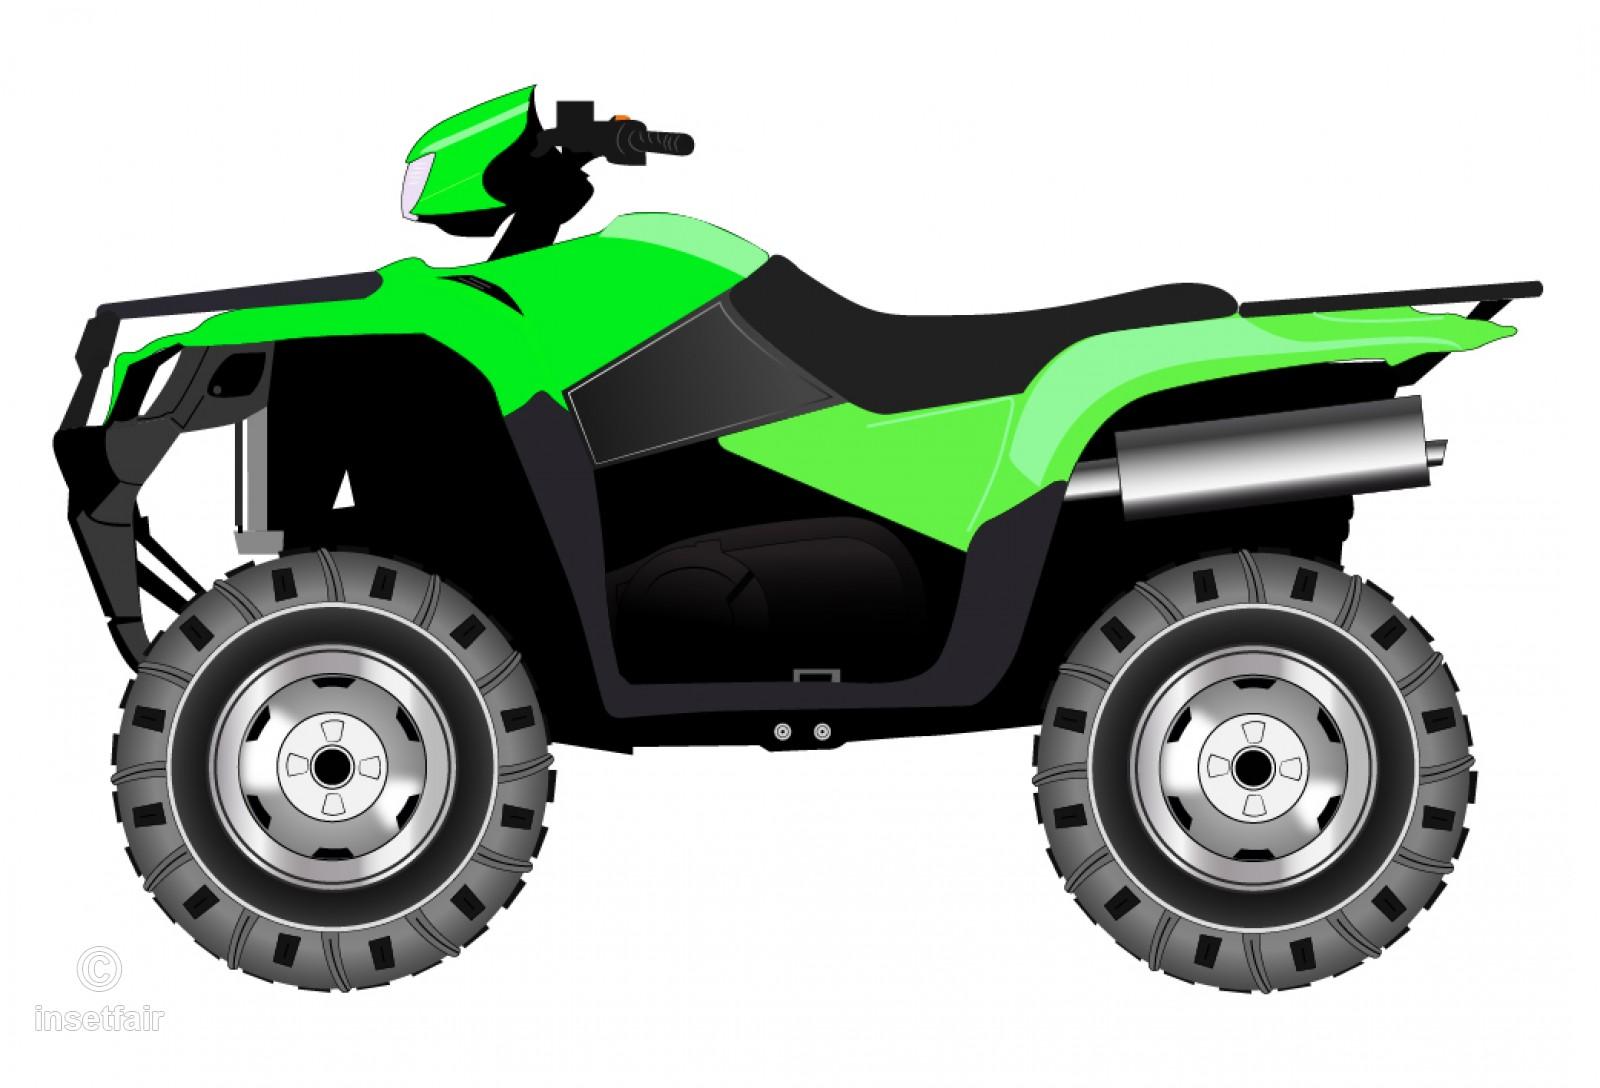 Quad bike vector clipart free png download.